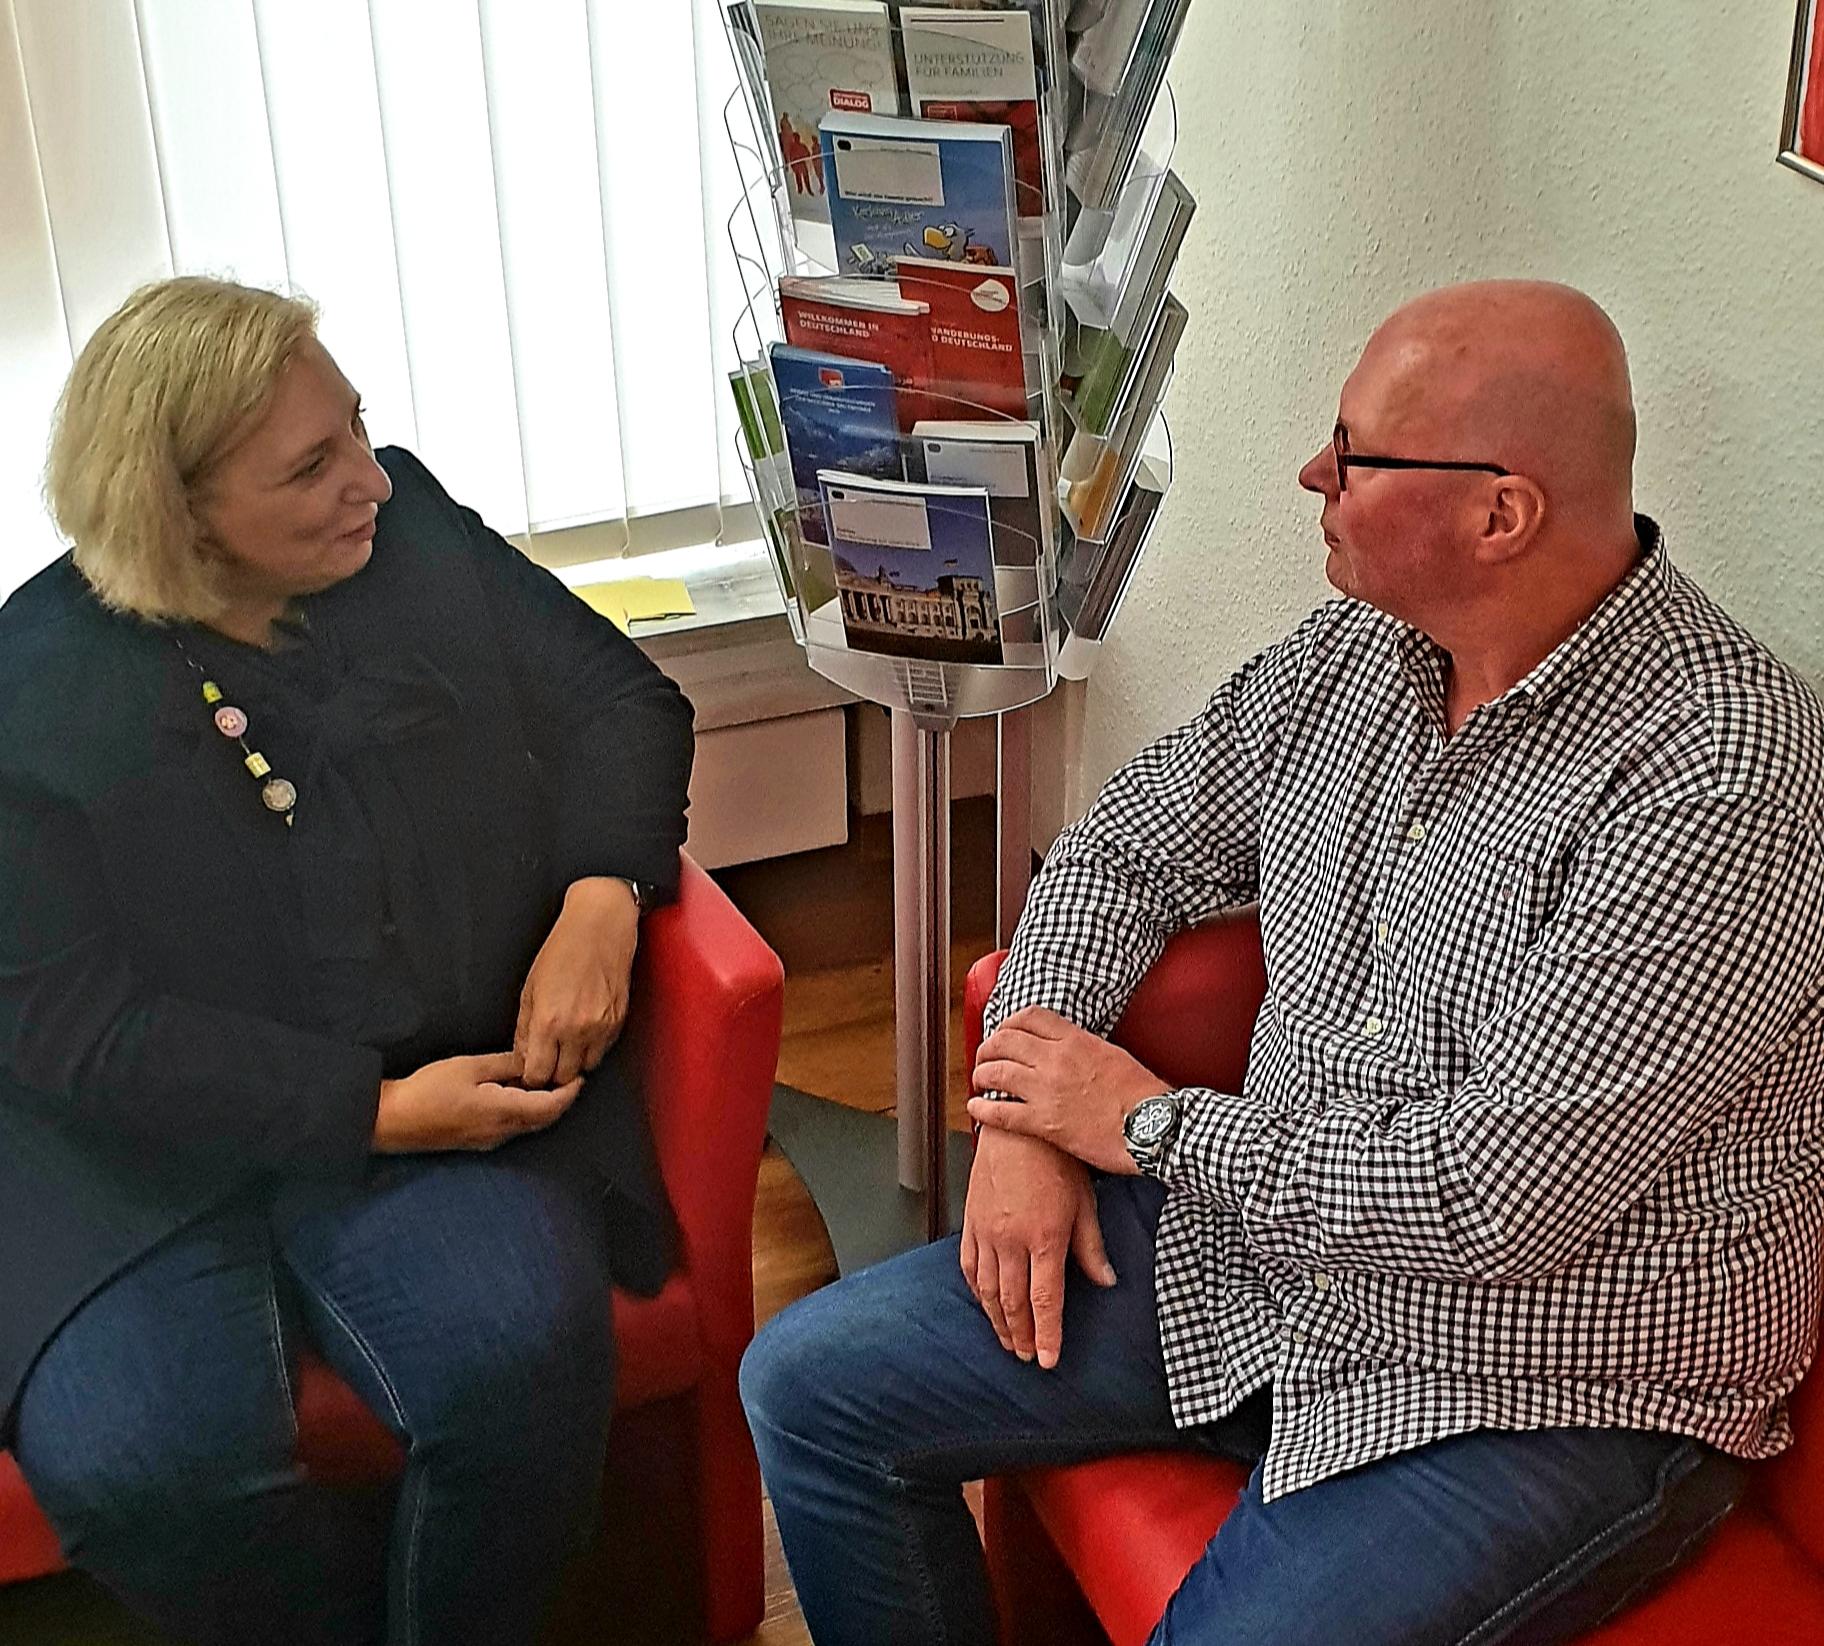 Dr. Daniela De Ridder im Gespräch mit Guido Sloot